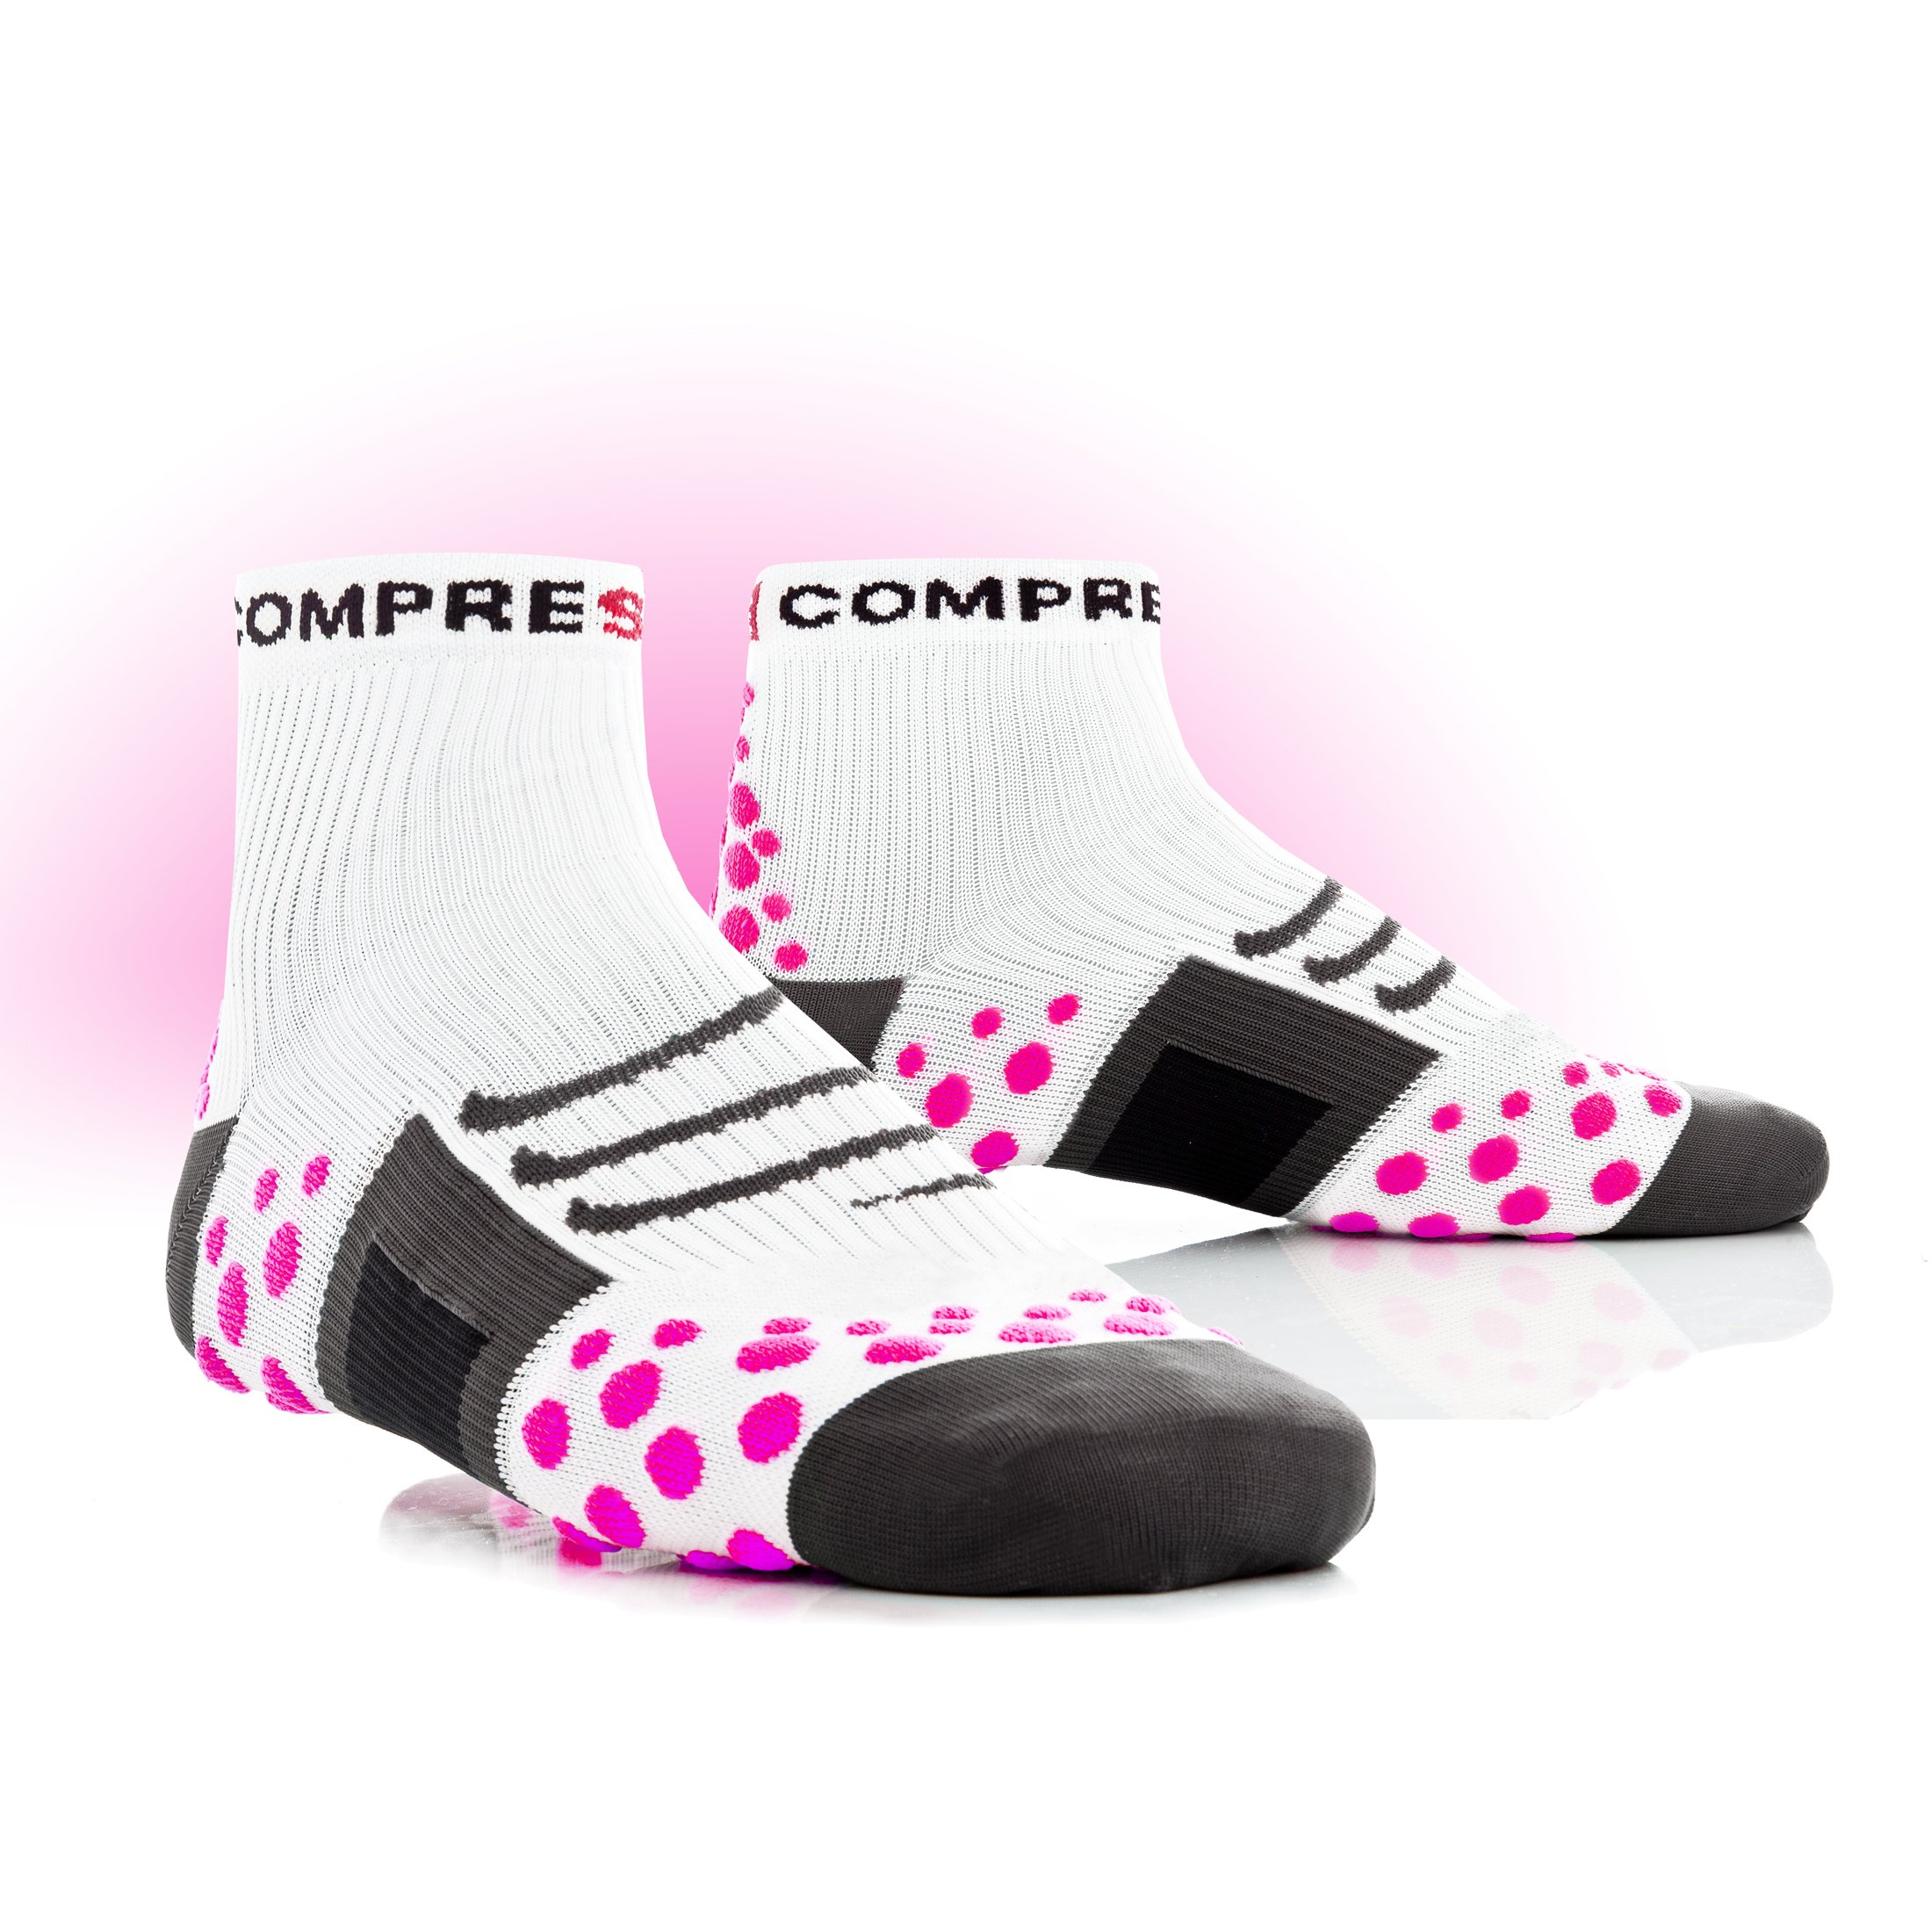 chaussettes de sport compressport proracing socks run pink dot blanc compression sport. Black Bedroom Furniture Sets. Home Design Ideas